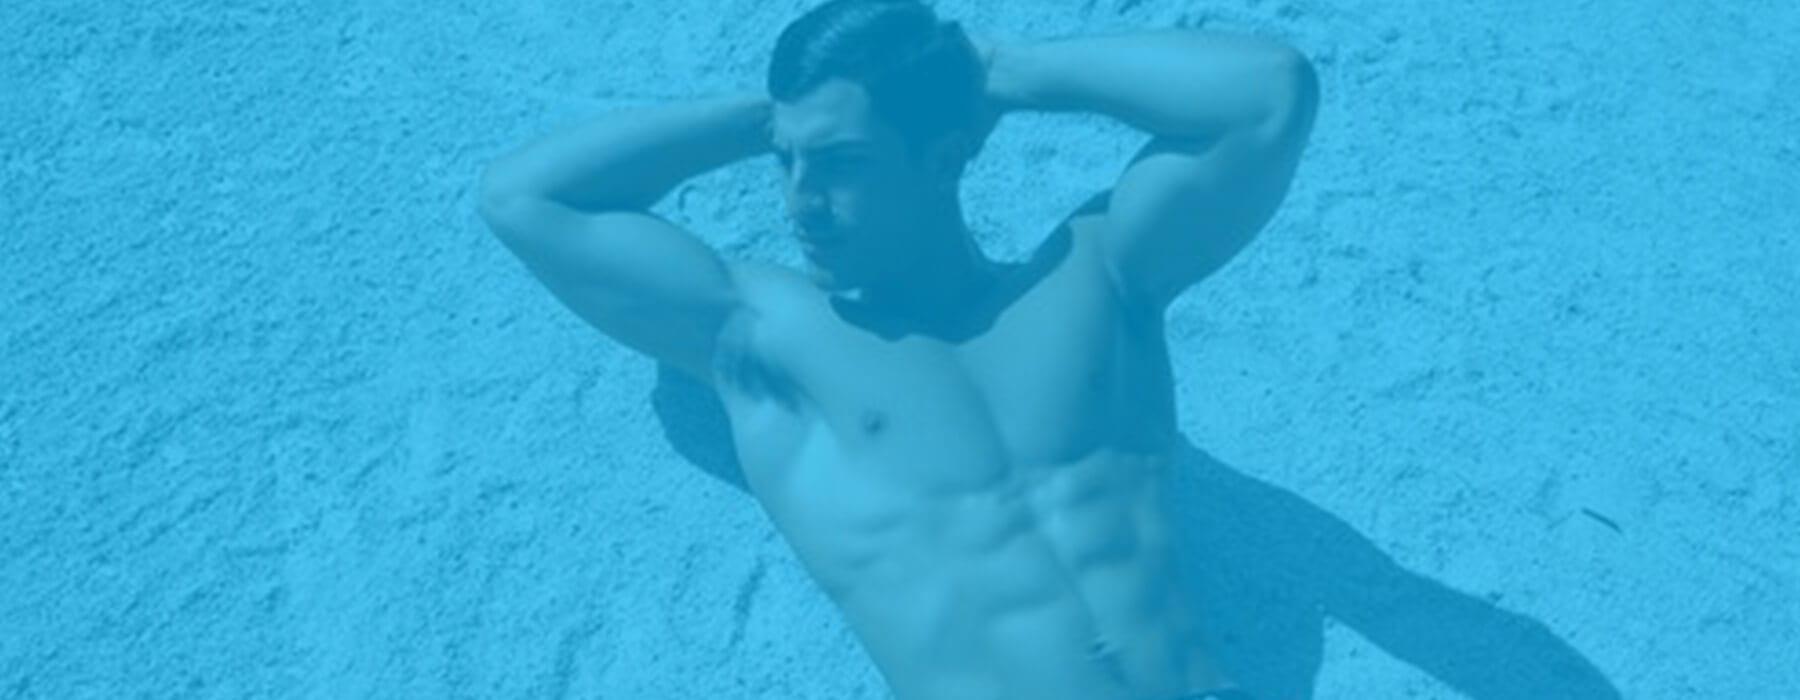 Five body transform tips winter